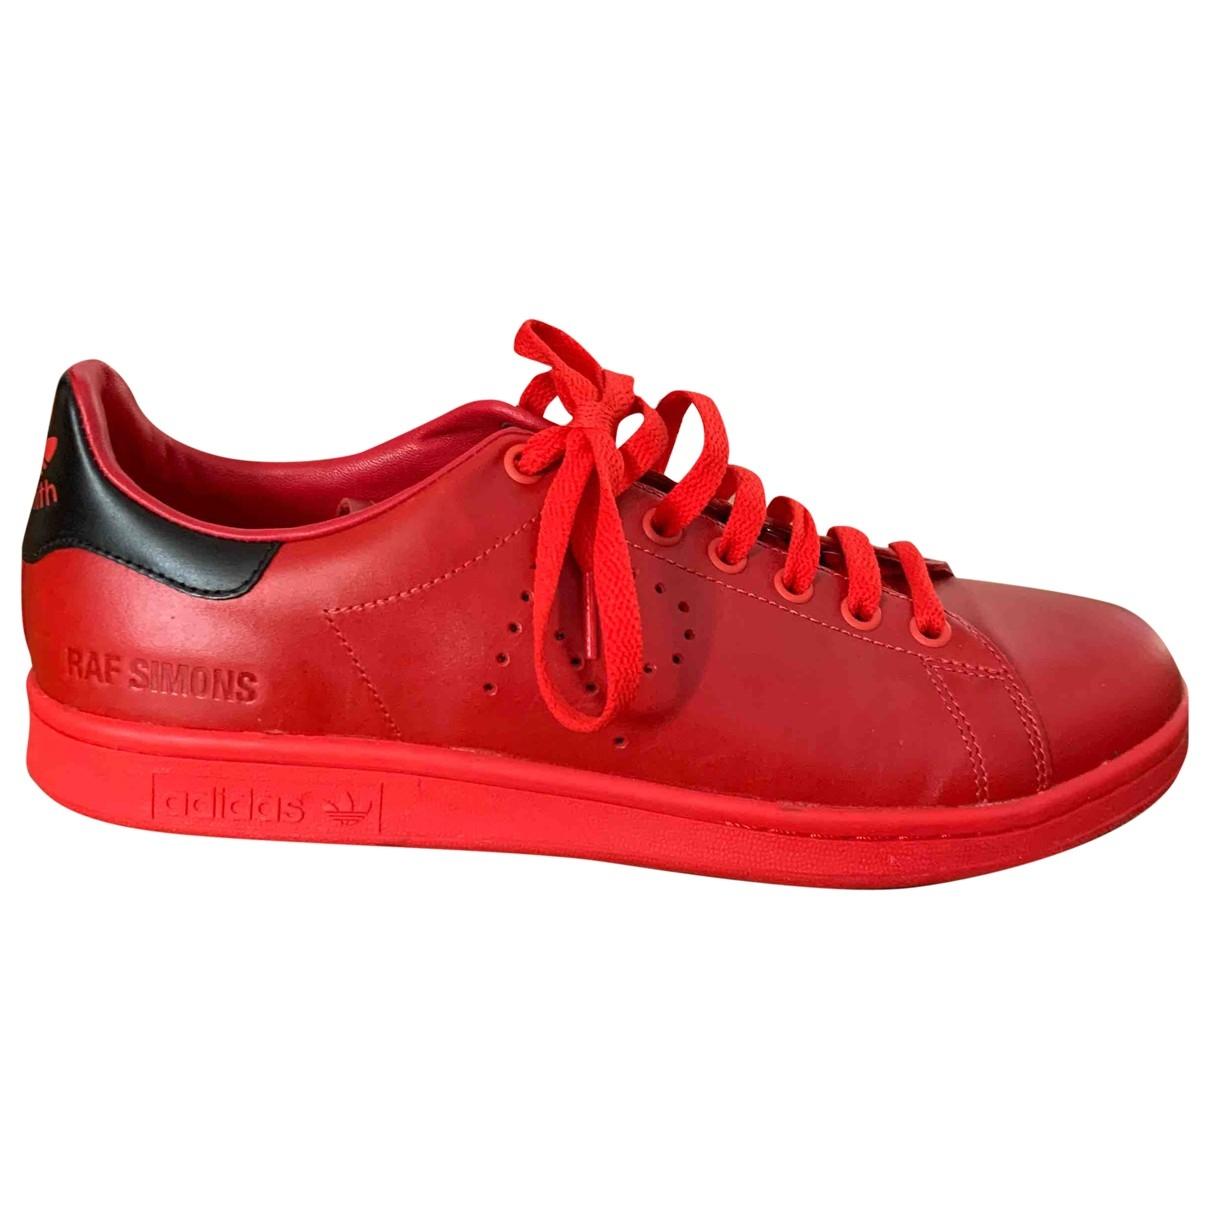 Deportivas Stan Smith de Cuero Adidas X Raf Simons